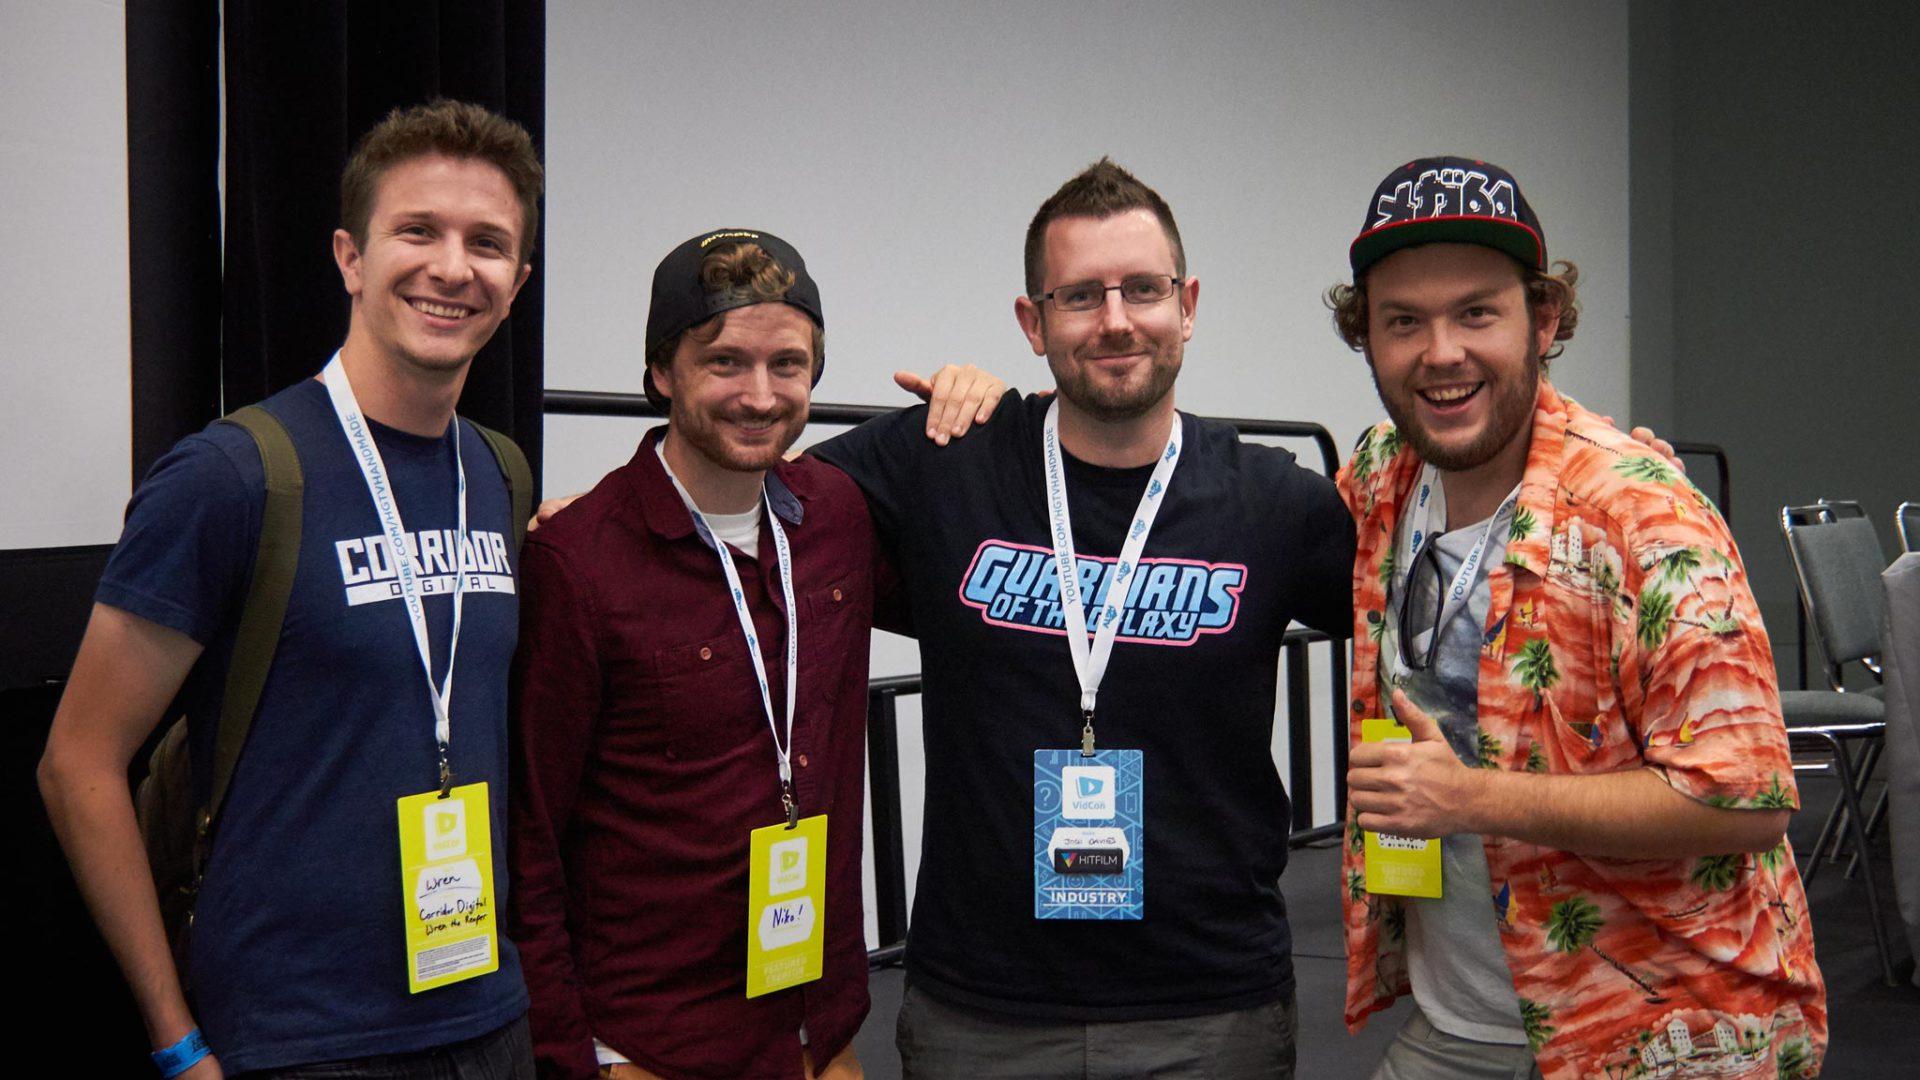 Josh (FXhome CEO) with Sam Gorski, Niko Pueringer, and Wren Wreichmann from Corridor Digital